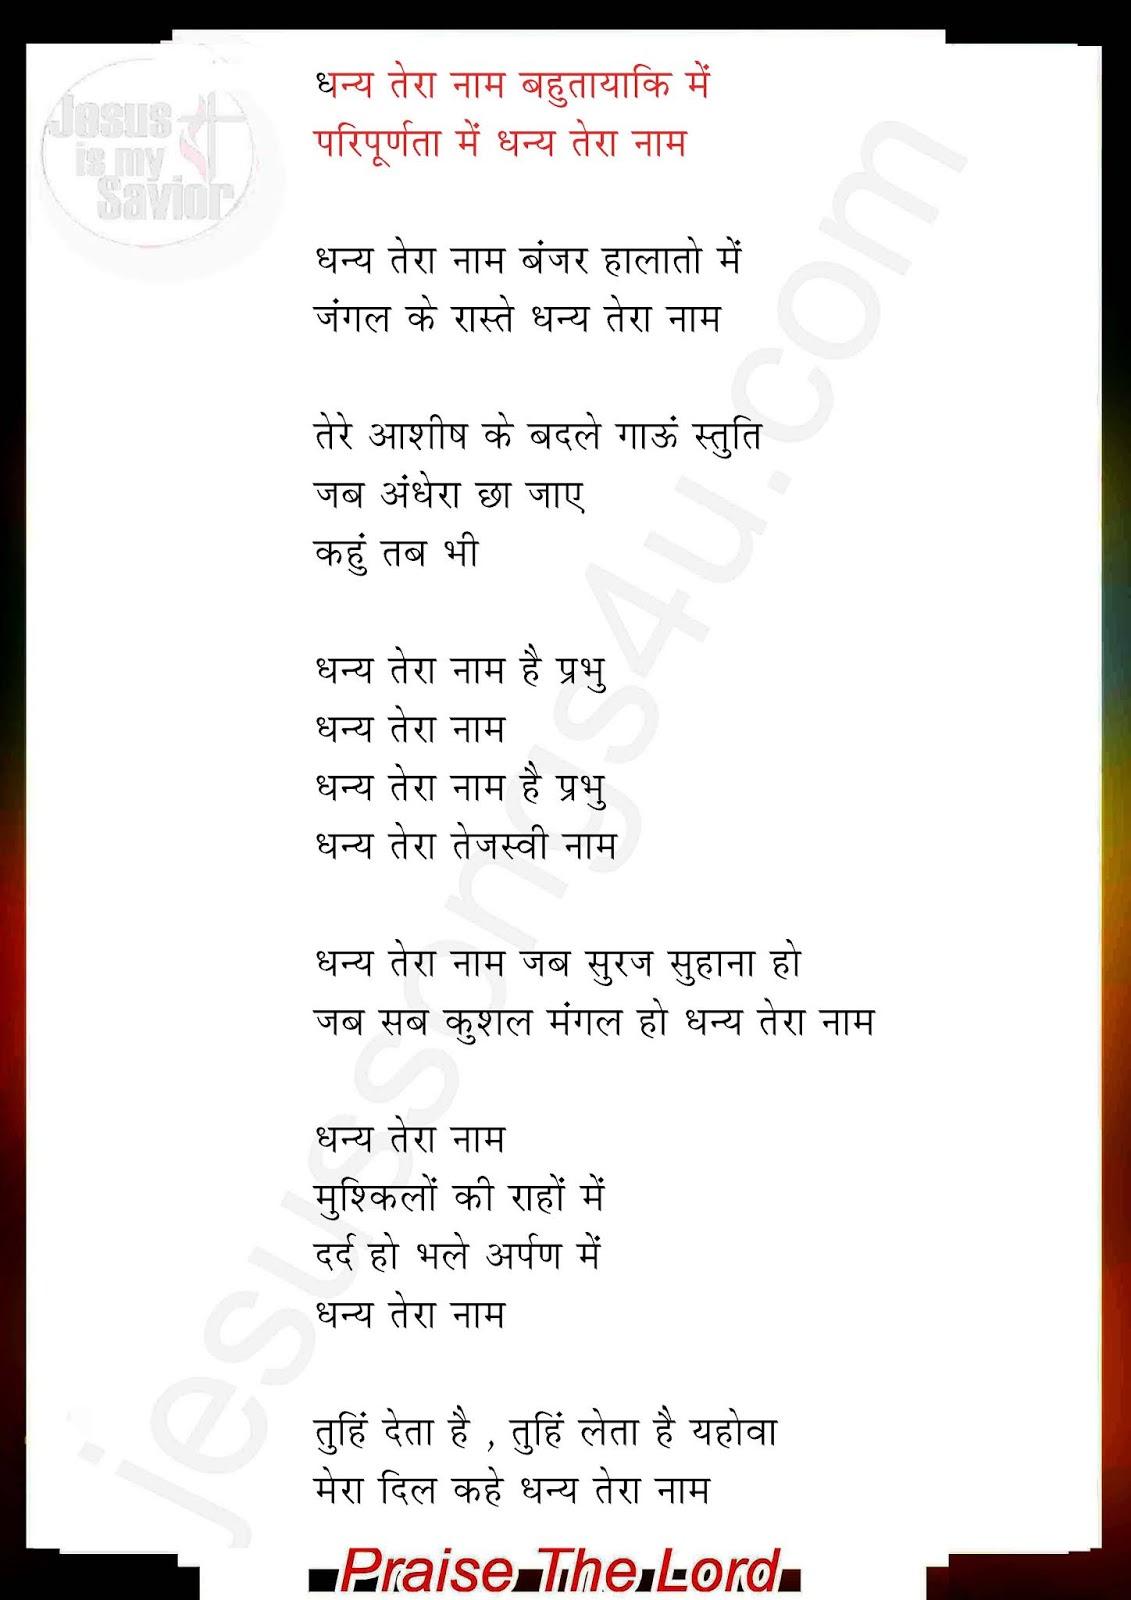 Dhanyo Tere Naam Jesus Song Lyrics Hindi À¤§à¤¨ À¤¯ À¤¤ À¤° À¤¨ À¤® À¤œ À¤¸à¤¸ À¤¸ À¤¨ À¤— À¤² À¤° À¤• À¤¸ New Christian Song S Lyrics Listen to these christian hindi songs or mp3. dhanyo tere naam jesus song lyrics